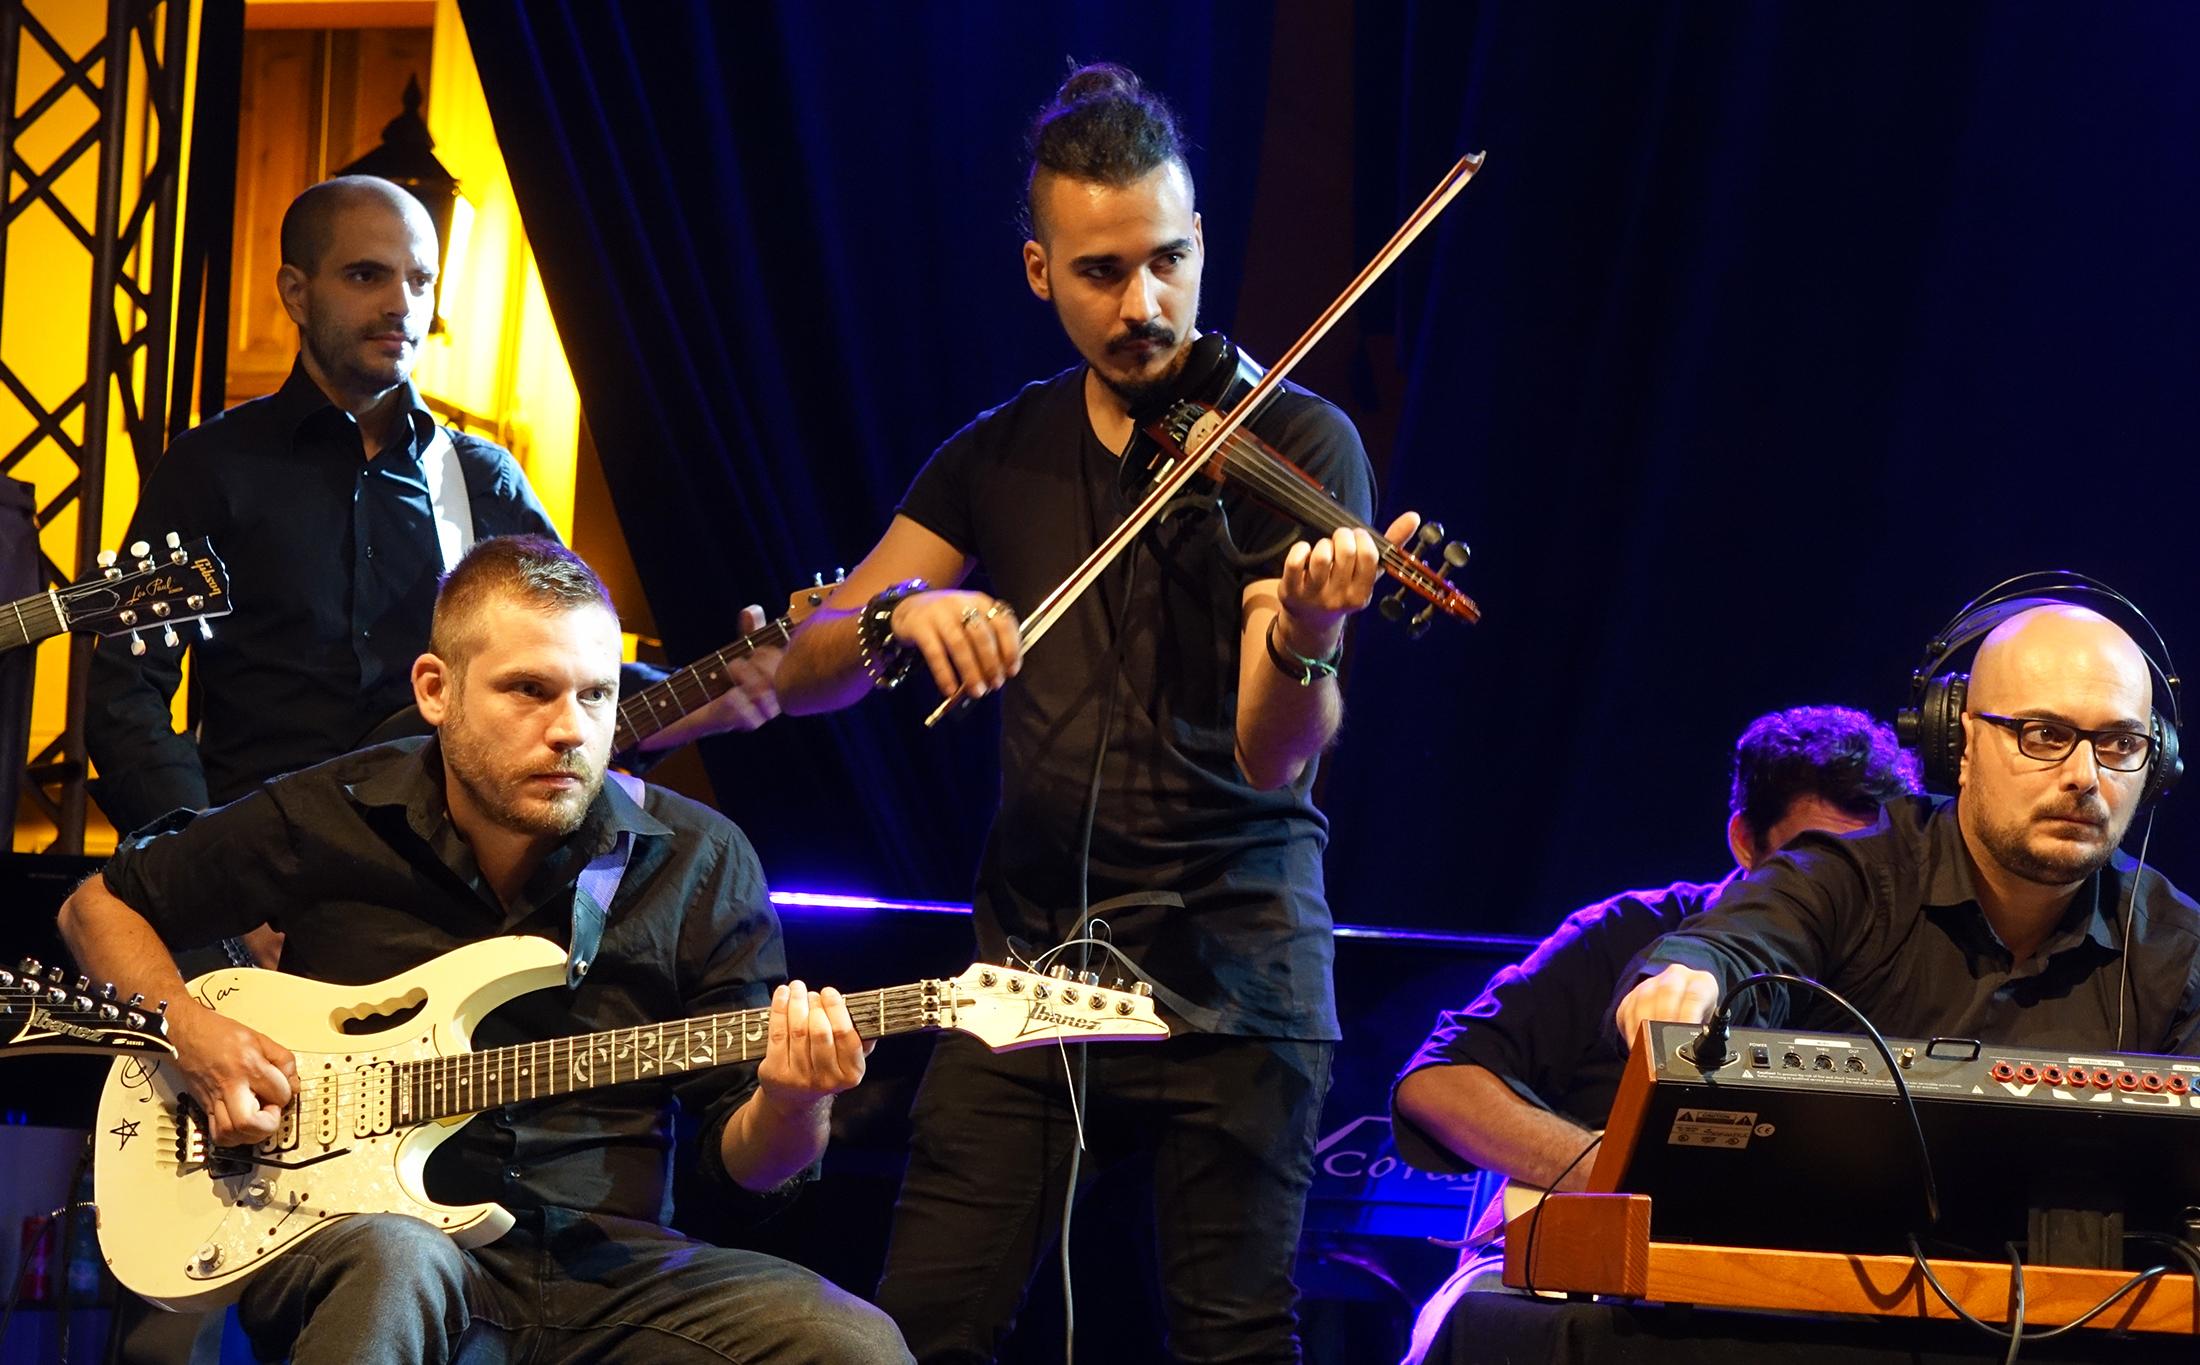 Cagliari Conservatoy of Music in Sant' Anna Arresi Sardinia 2018